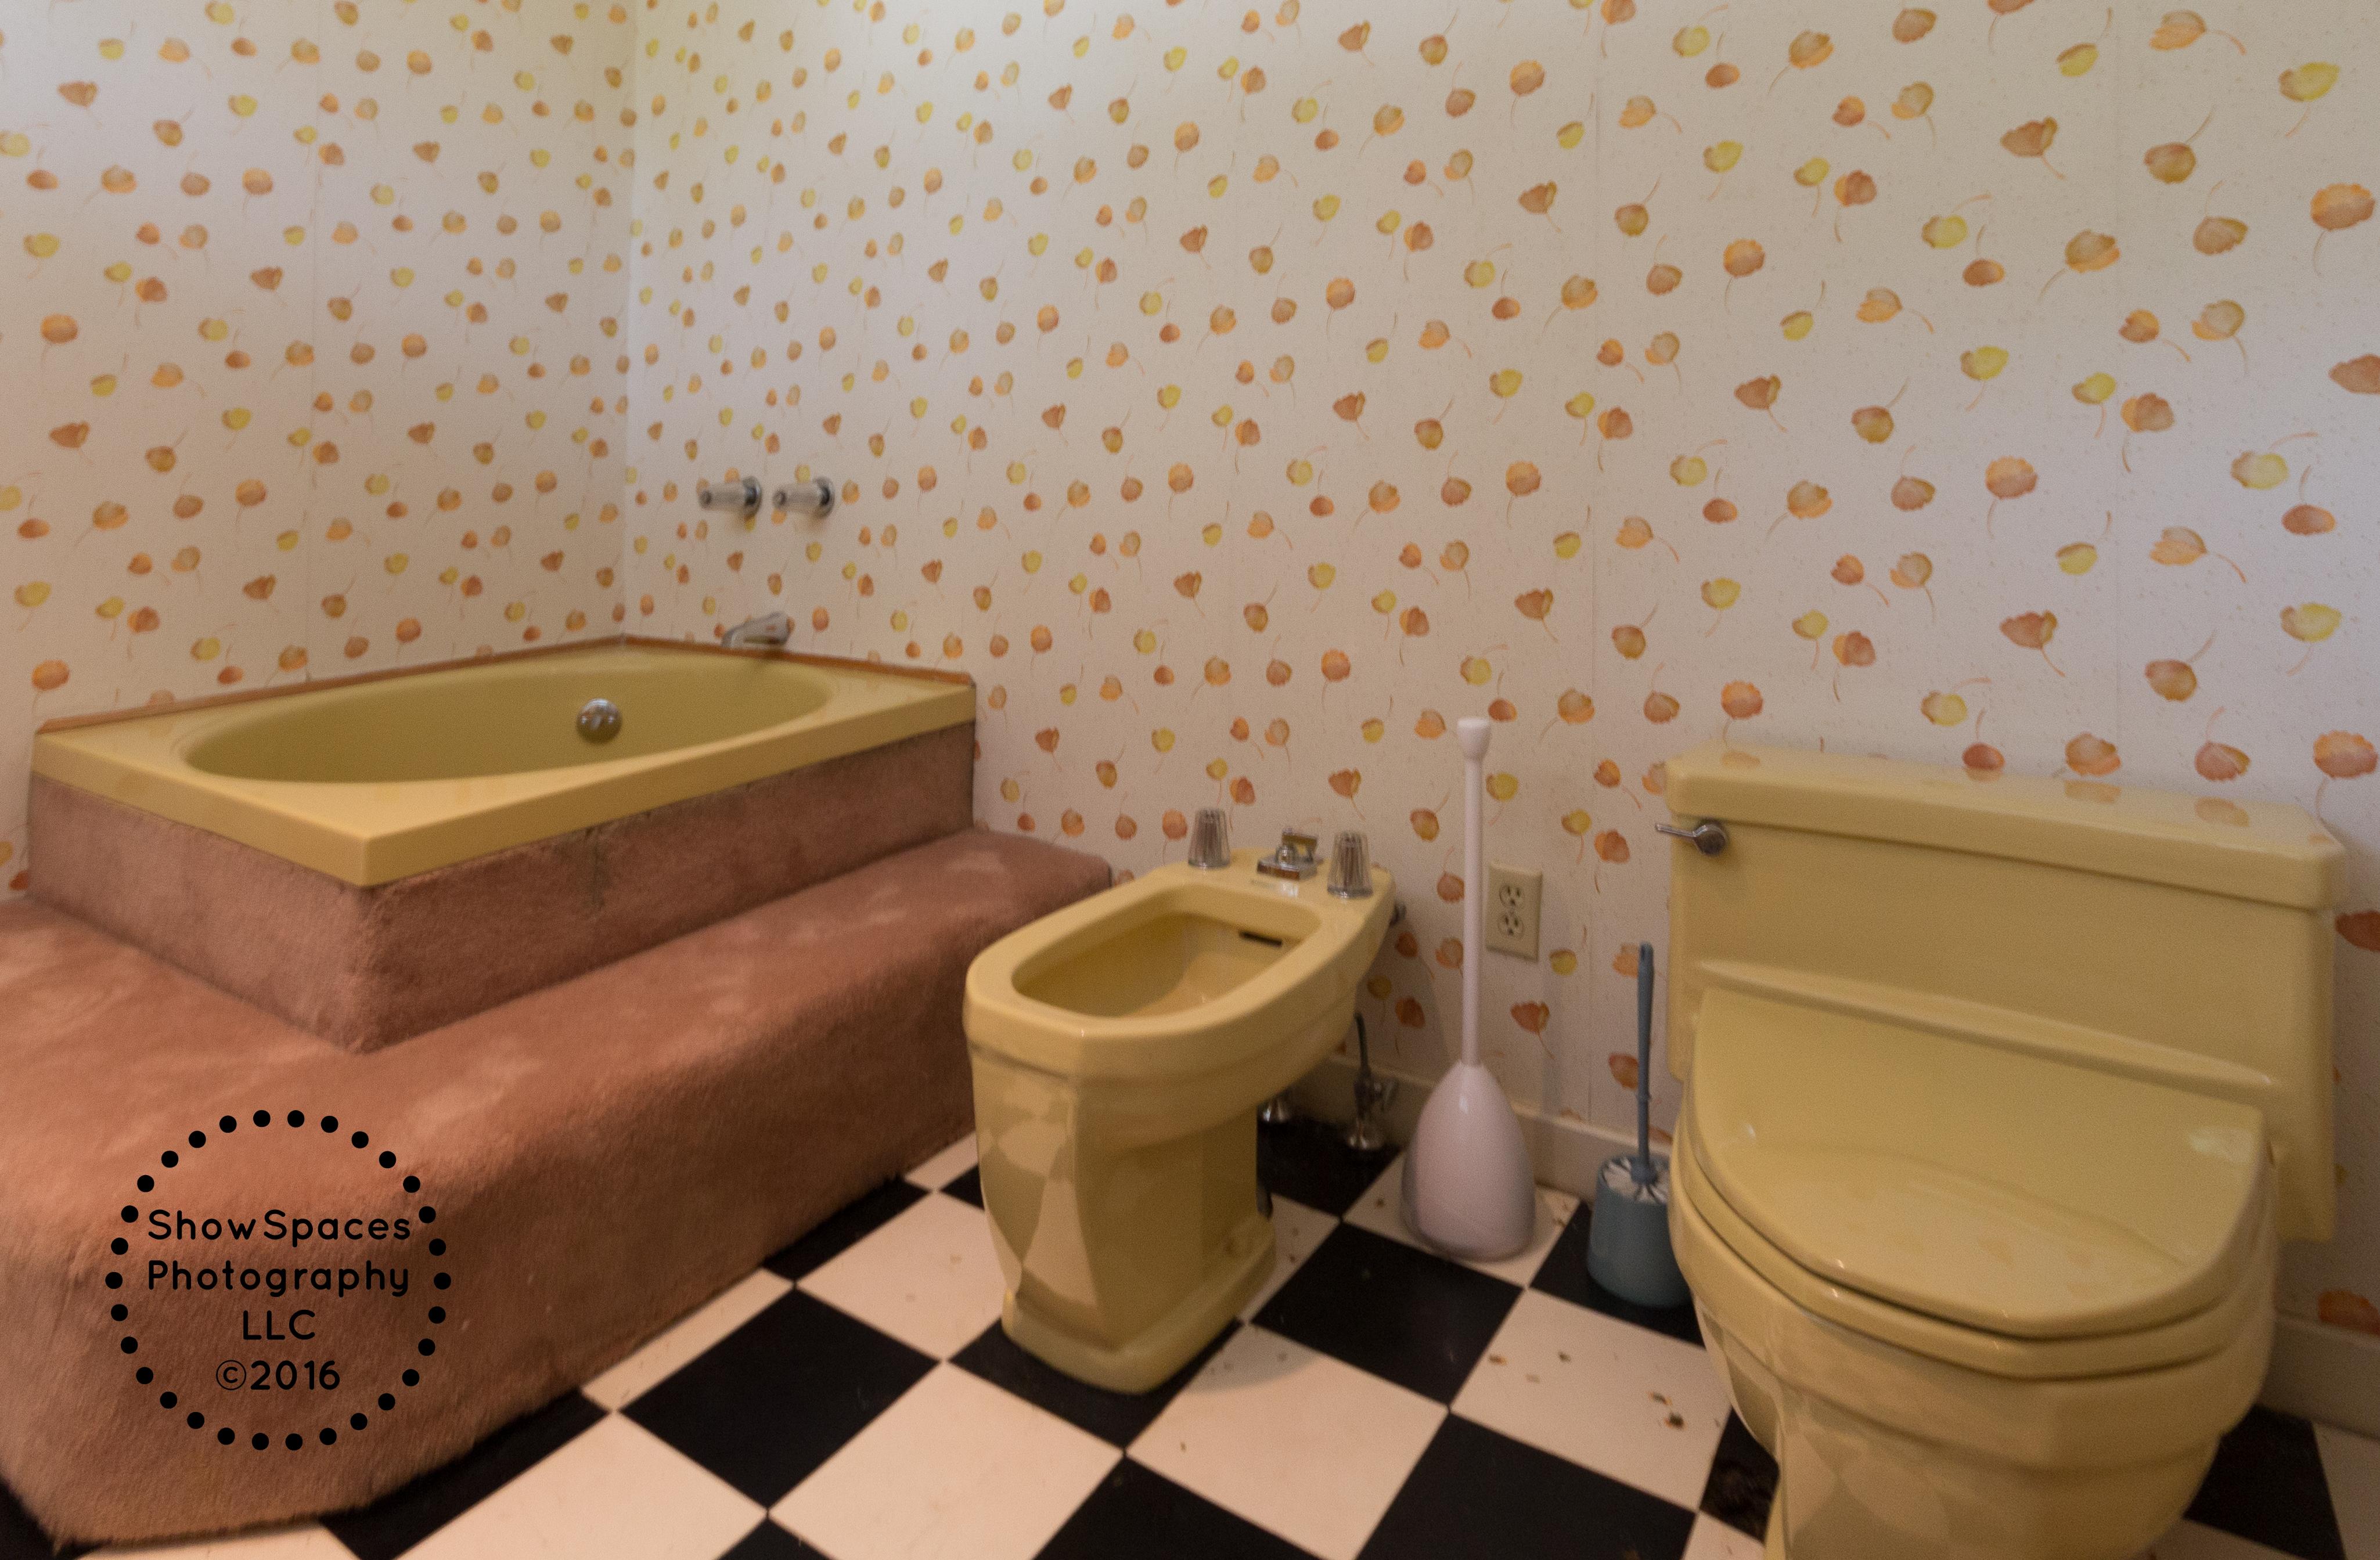 harvest gold toilet seat. Master Bathroom  Harvest Gold Fixtures including Carpeted Steps to Barrel Tub Toilet and Bidet James Taylor s Childhood Home ShowSpaces Photography LLC